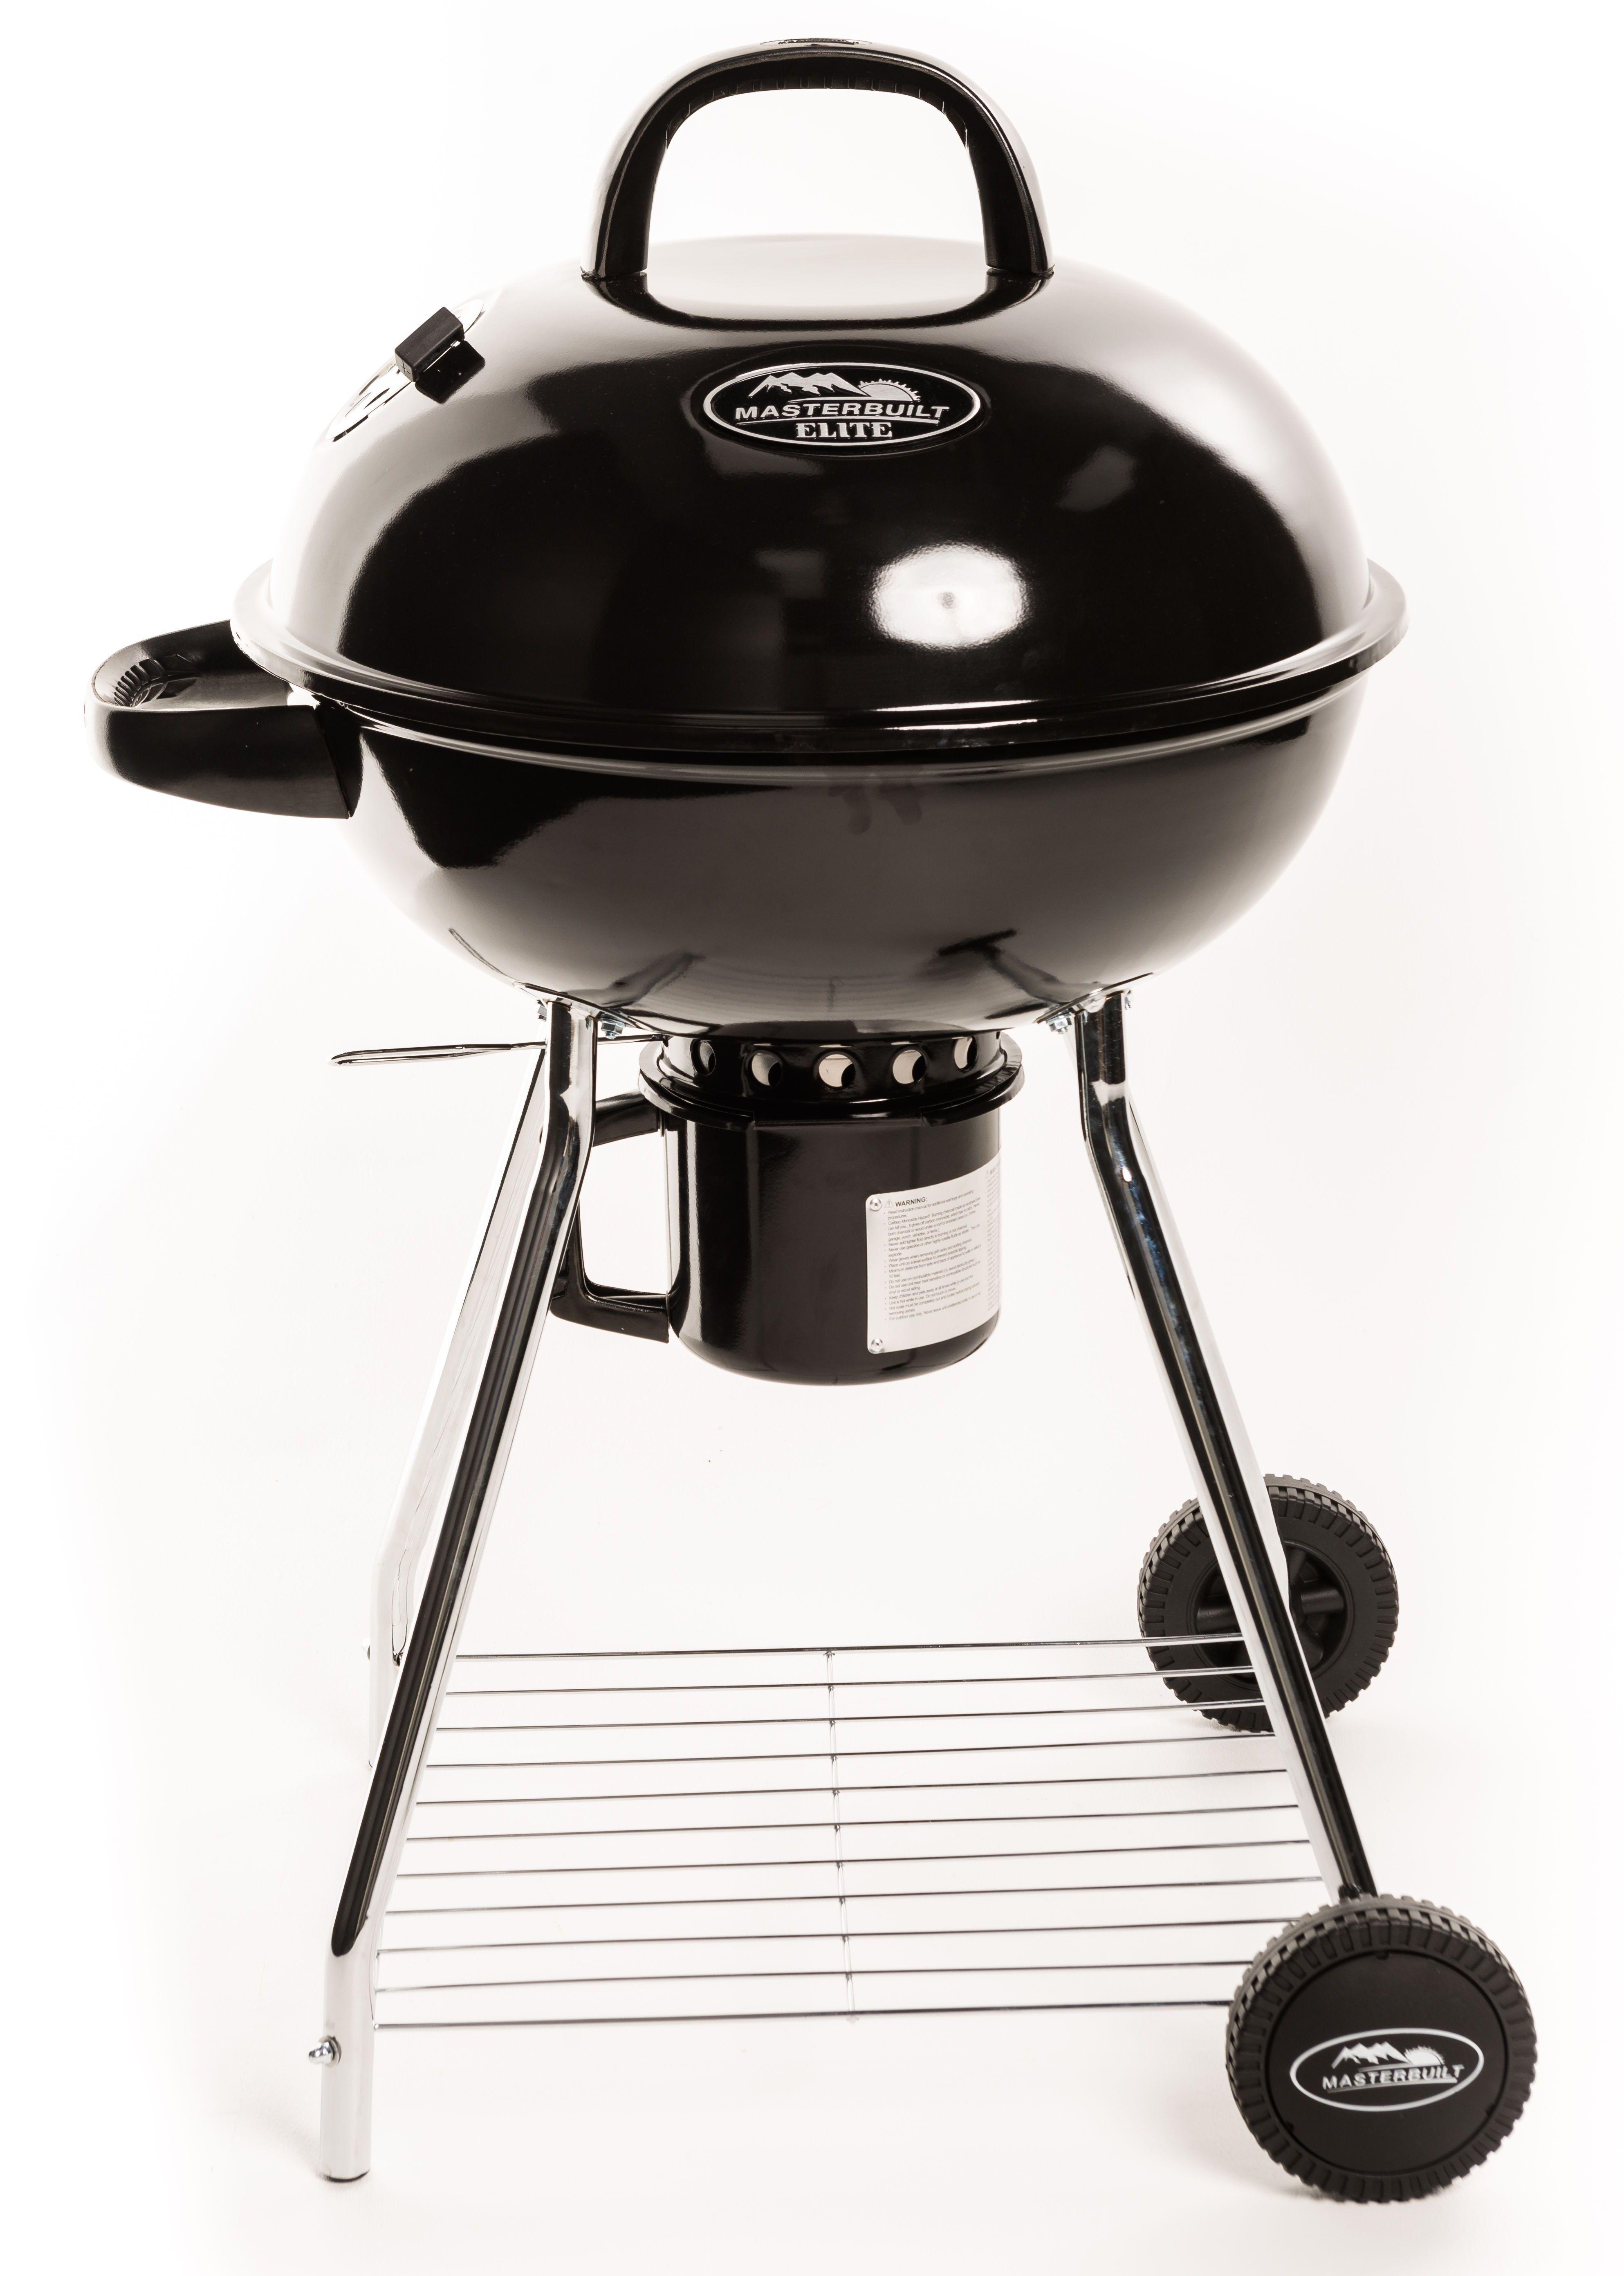 Amazon.com : Masterbuilt 20040311 Elite Kettle Grill, 22.5 ...